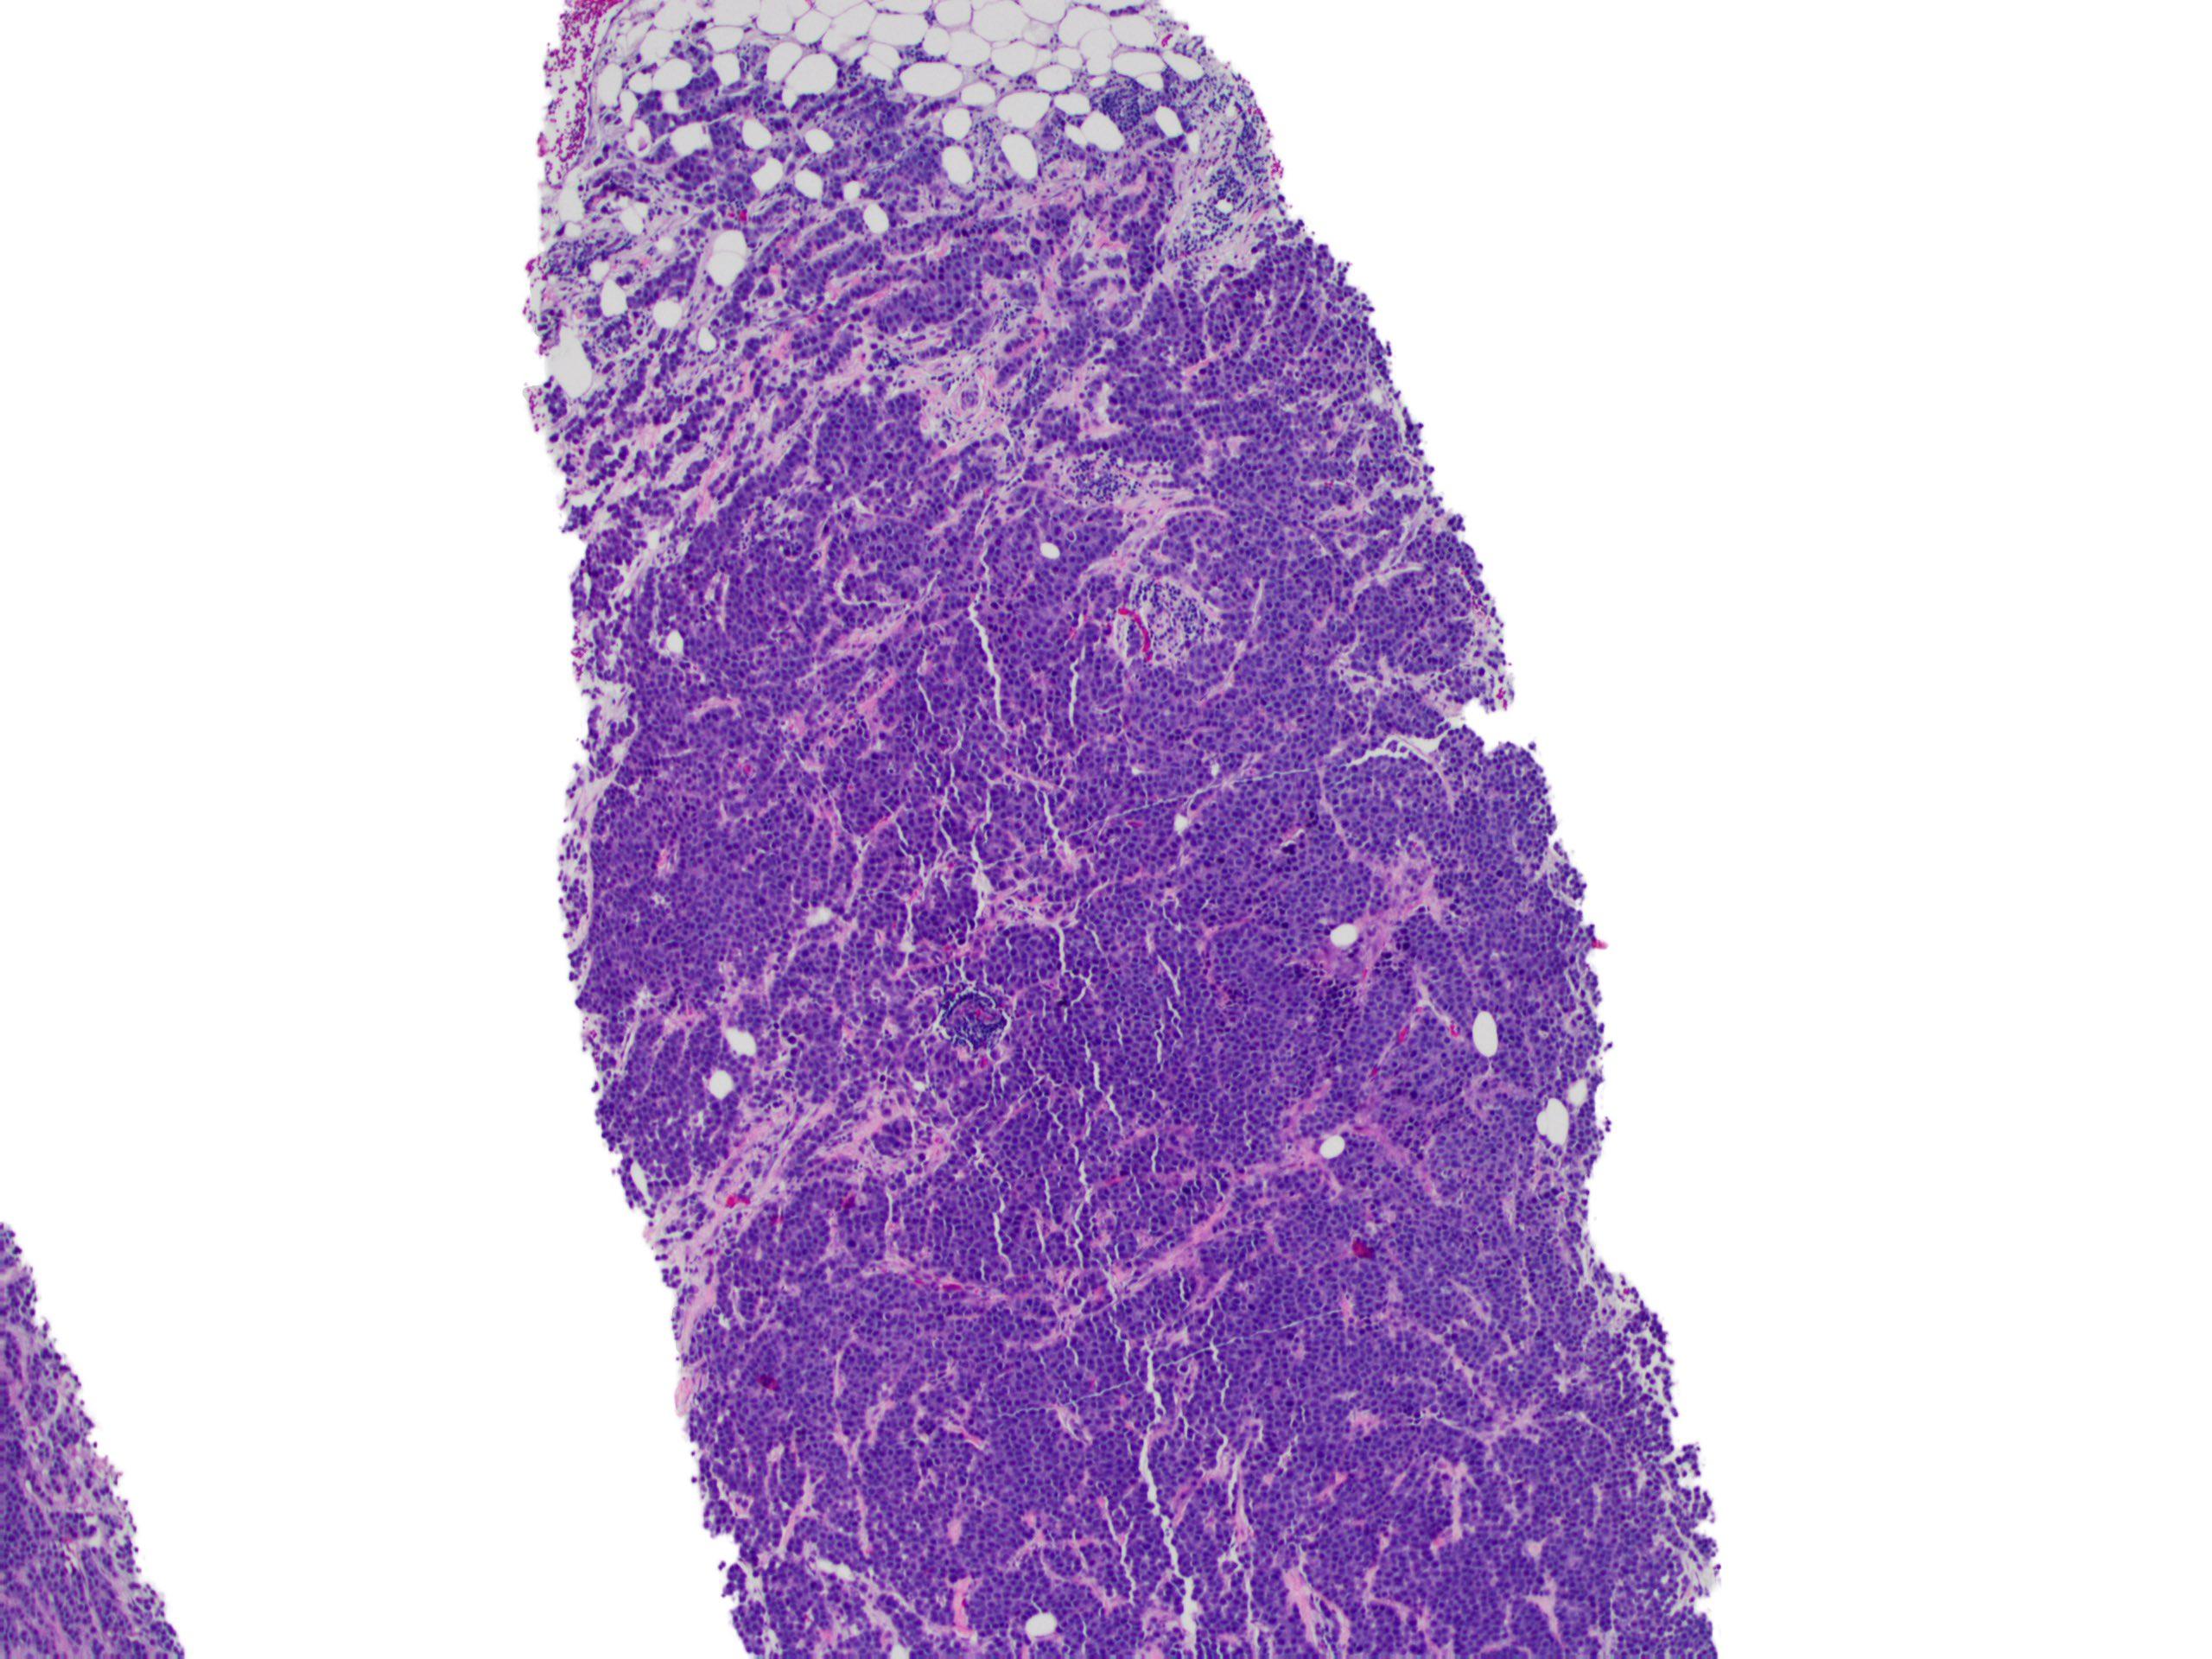 Invasive lobular carcinoma of the breast